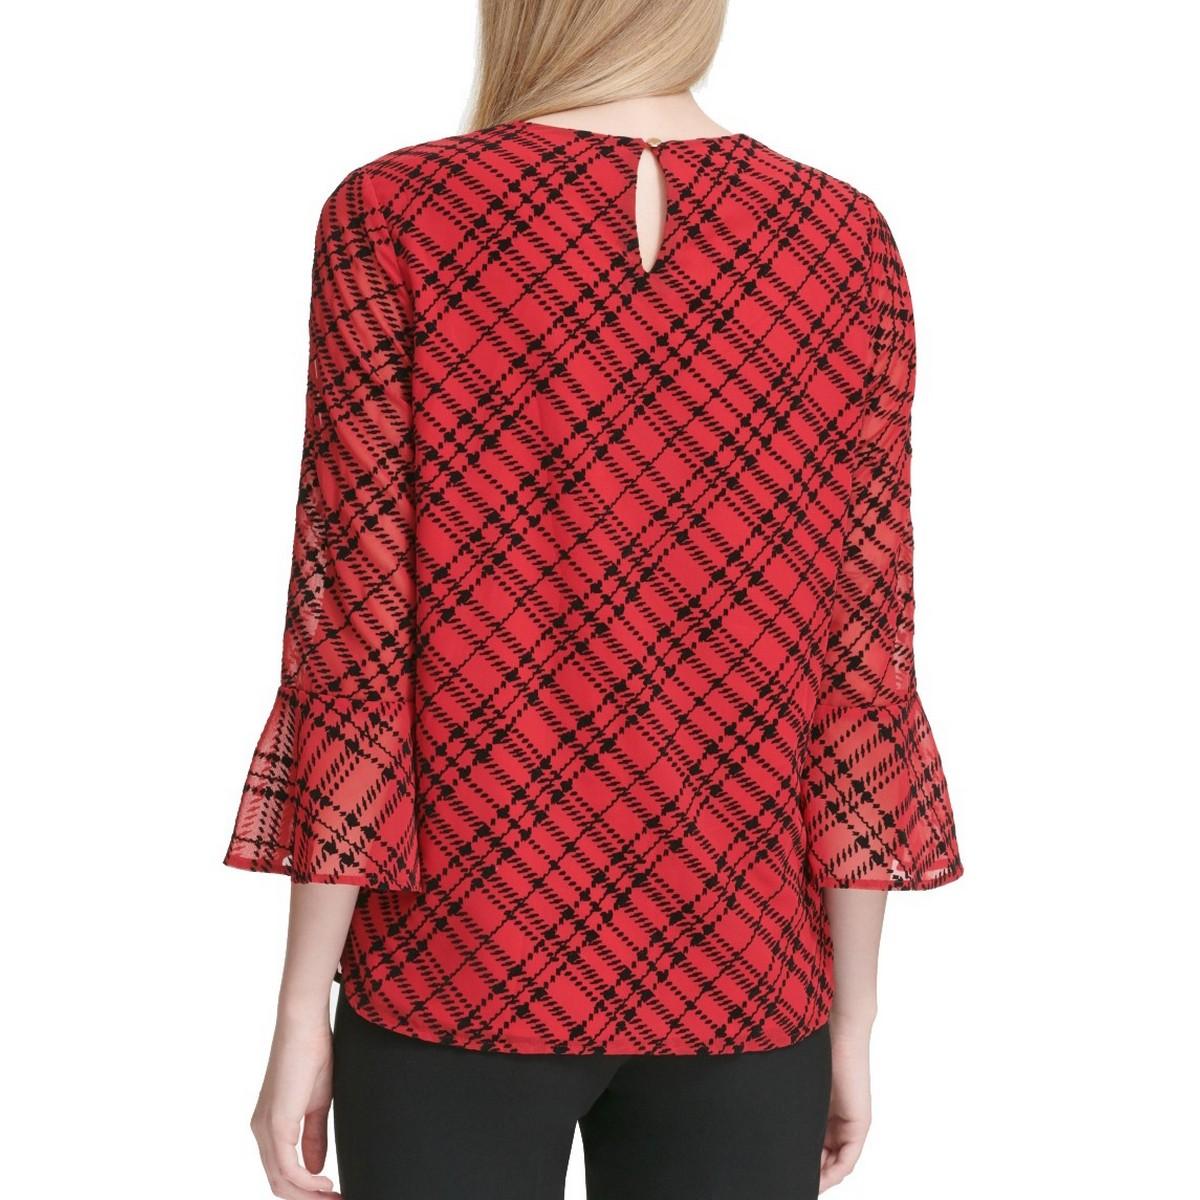 CALVIN-KLEIN-NEW-Women-039-s-Printed-Bell-sleeve-Blouse-Shirt-Top-TEDO thumbnail 4